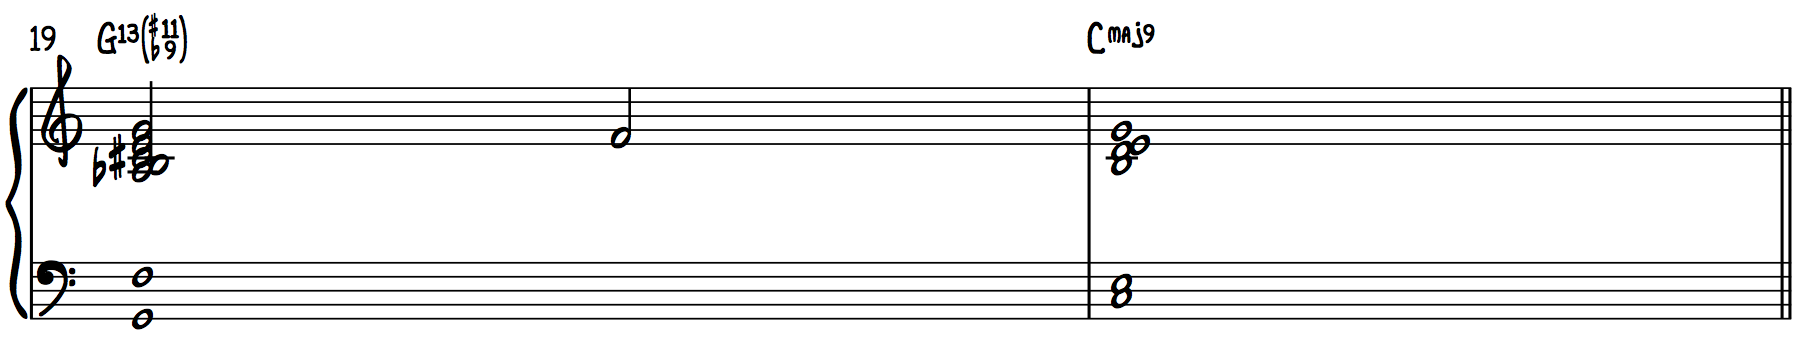 Intro Chords (#11, b9 Chords) Piano run